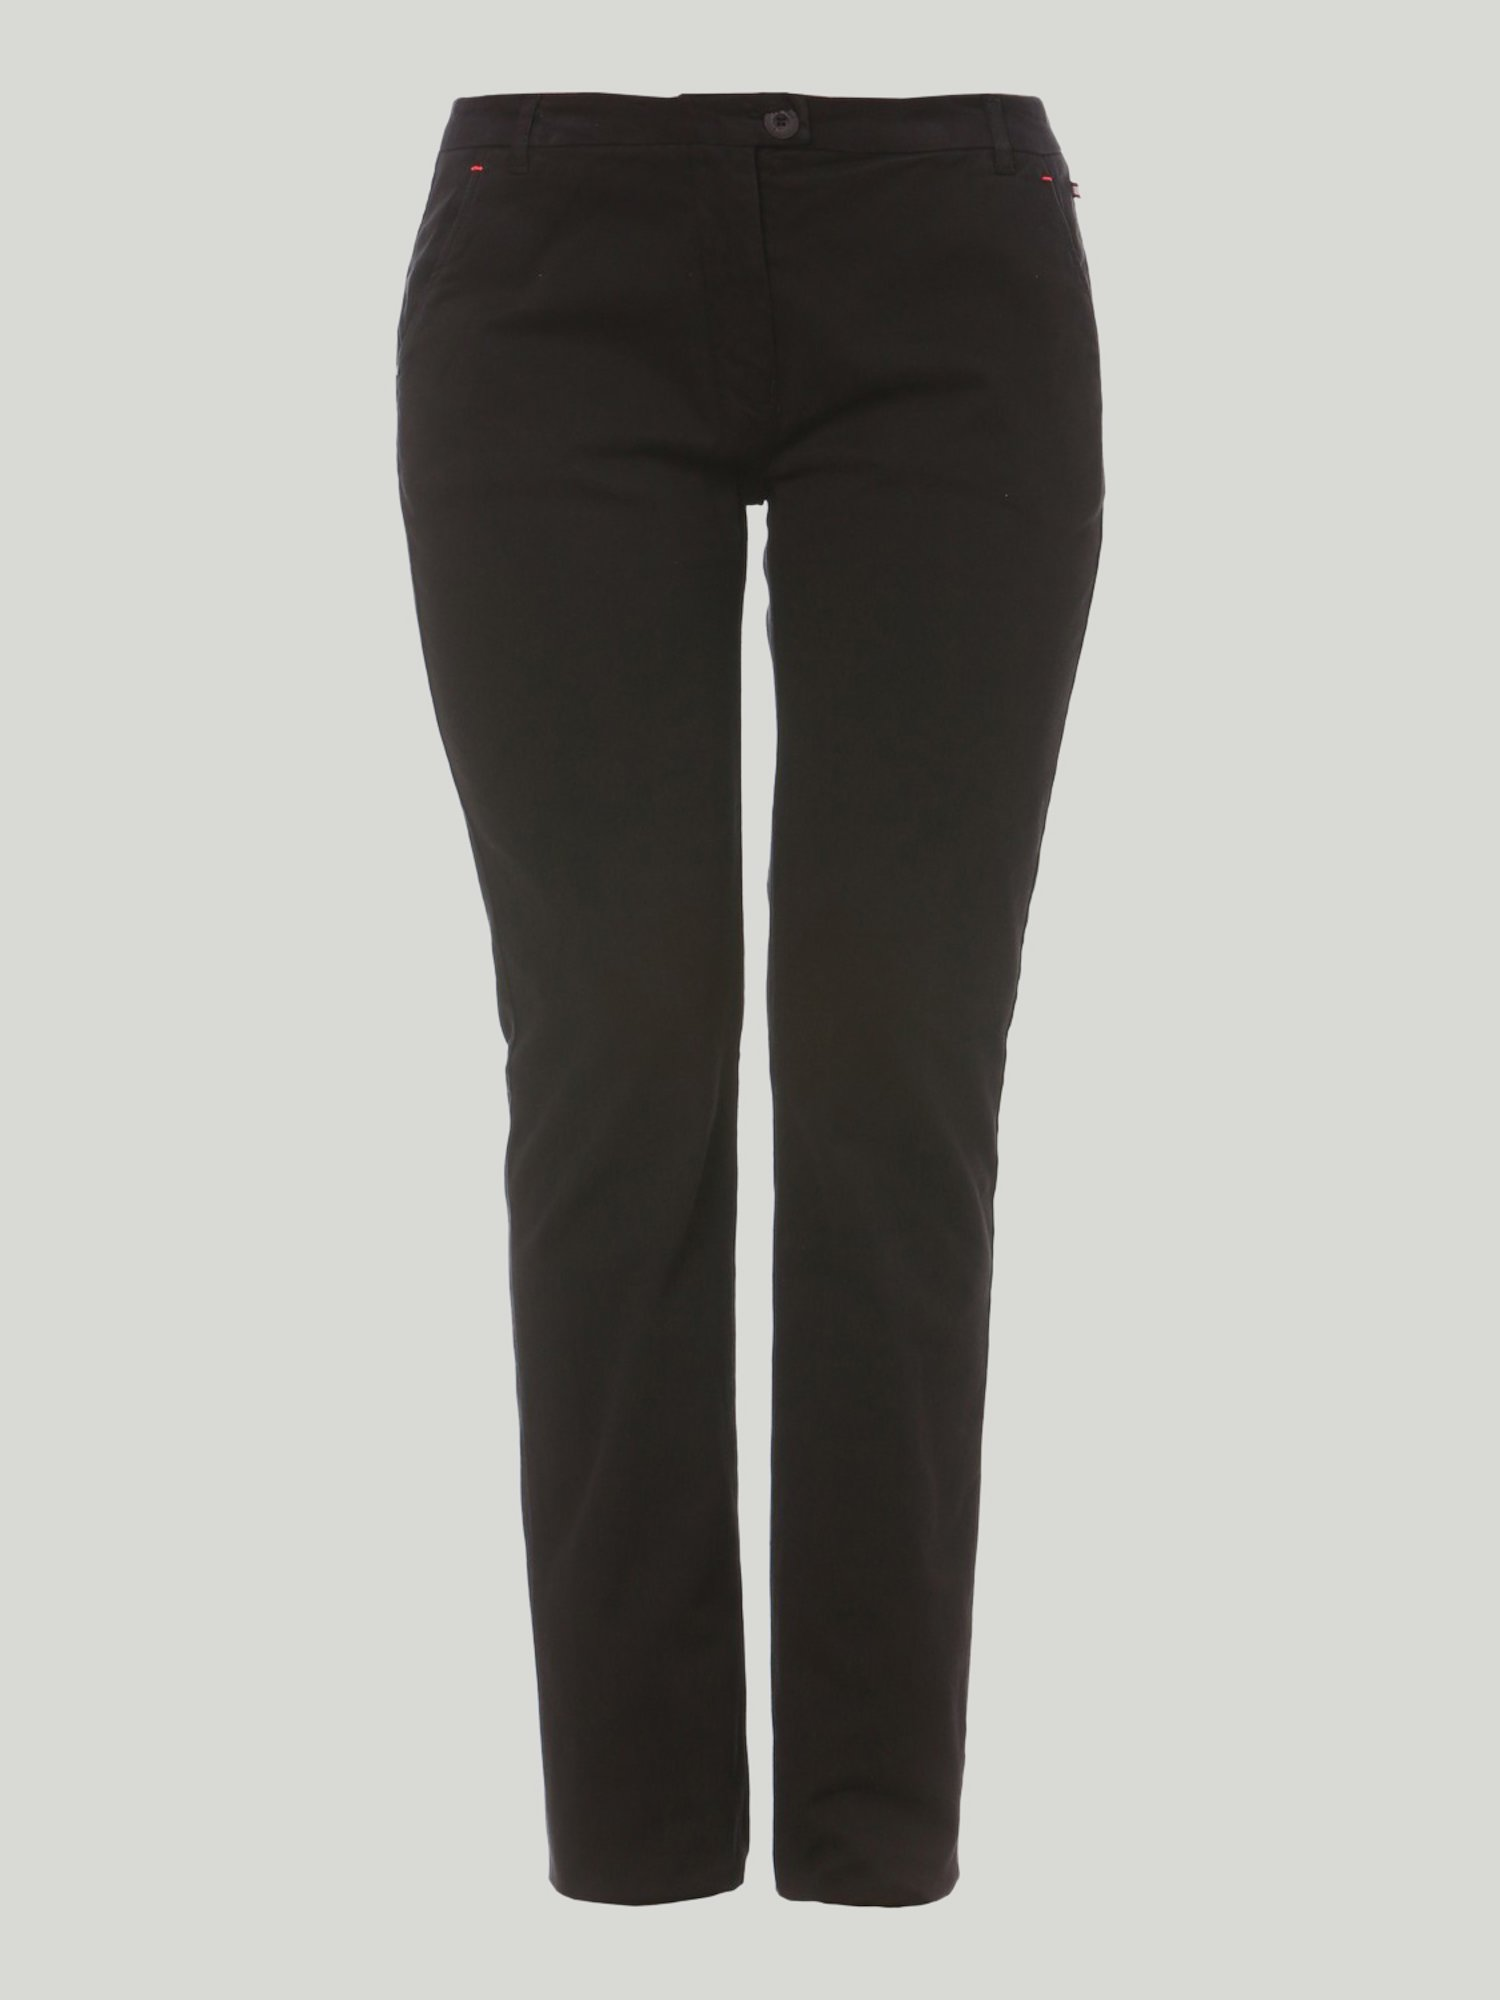 Pantaloni Bellona - Nero